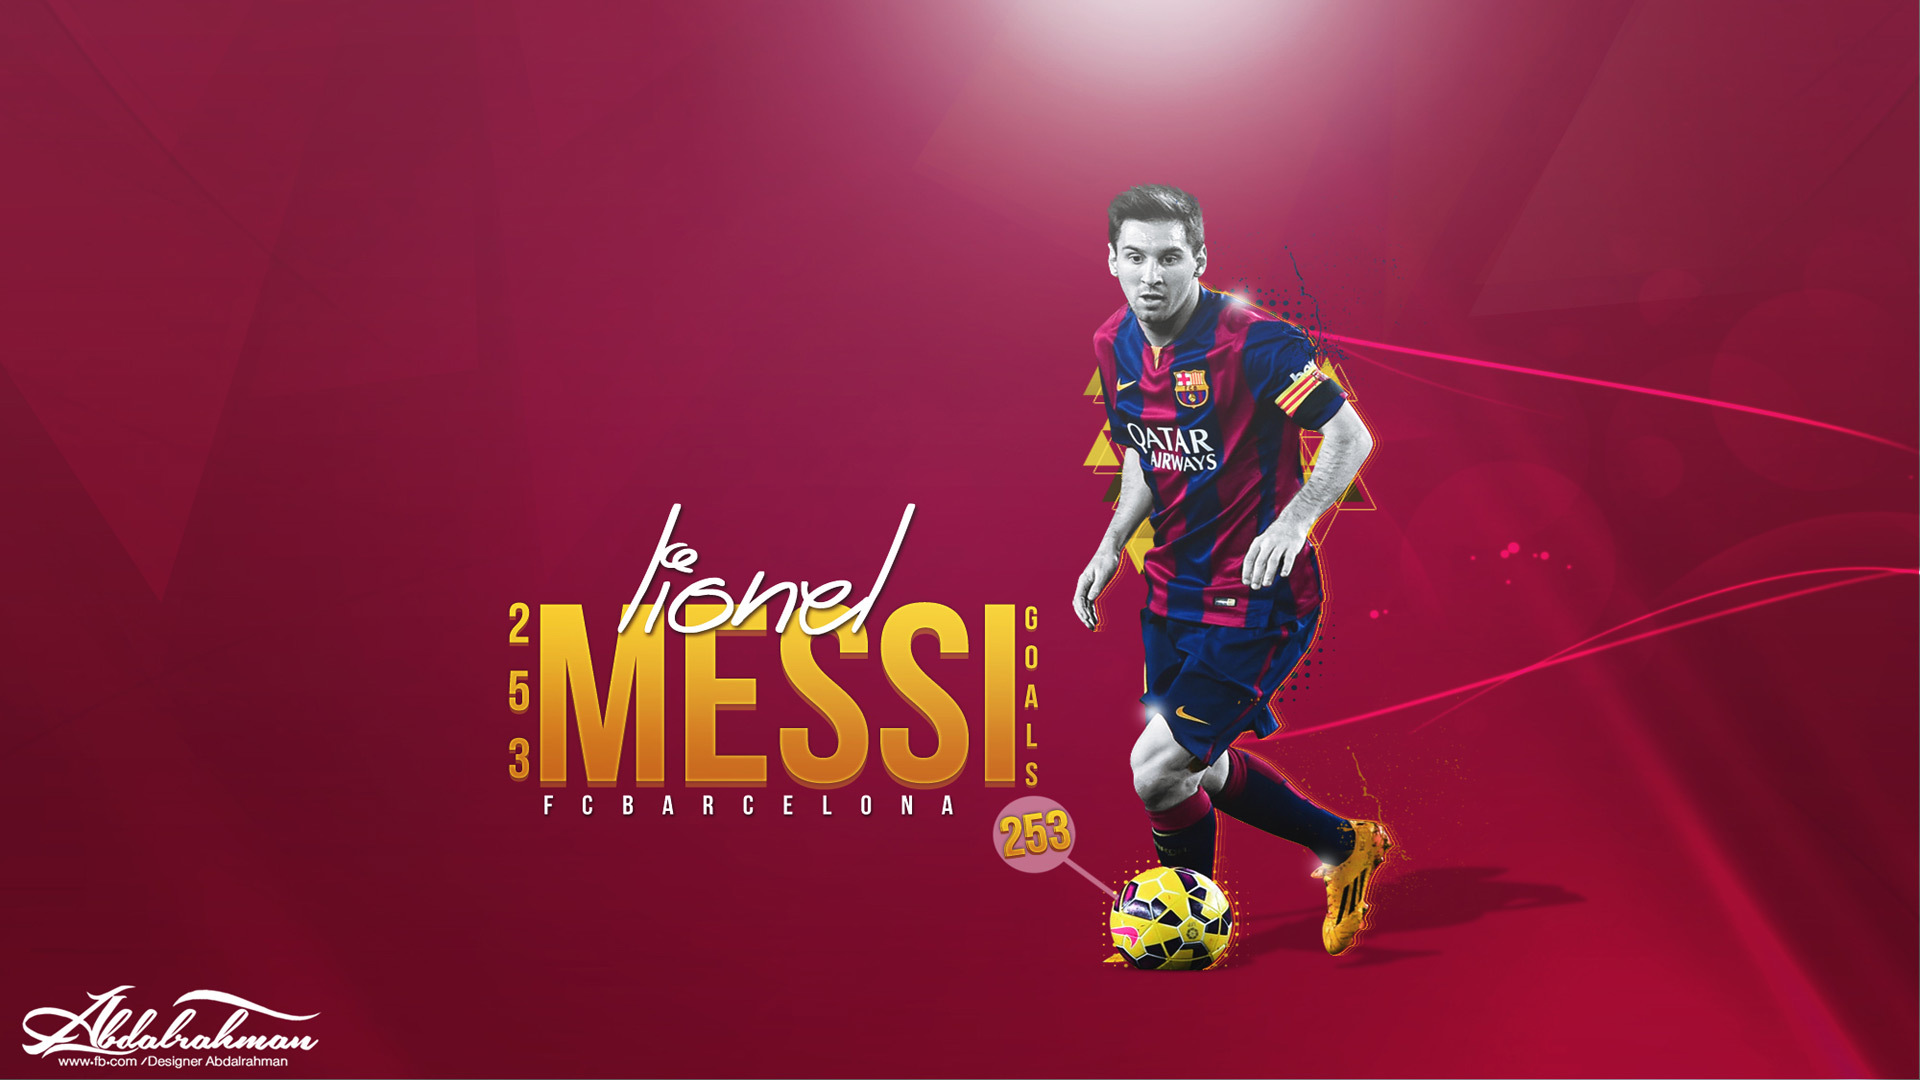 Lionel Messi High Definition